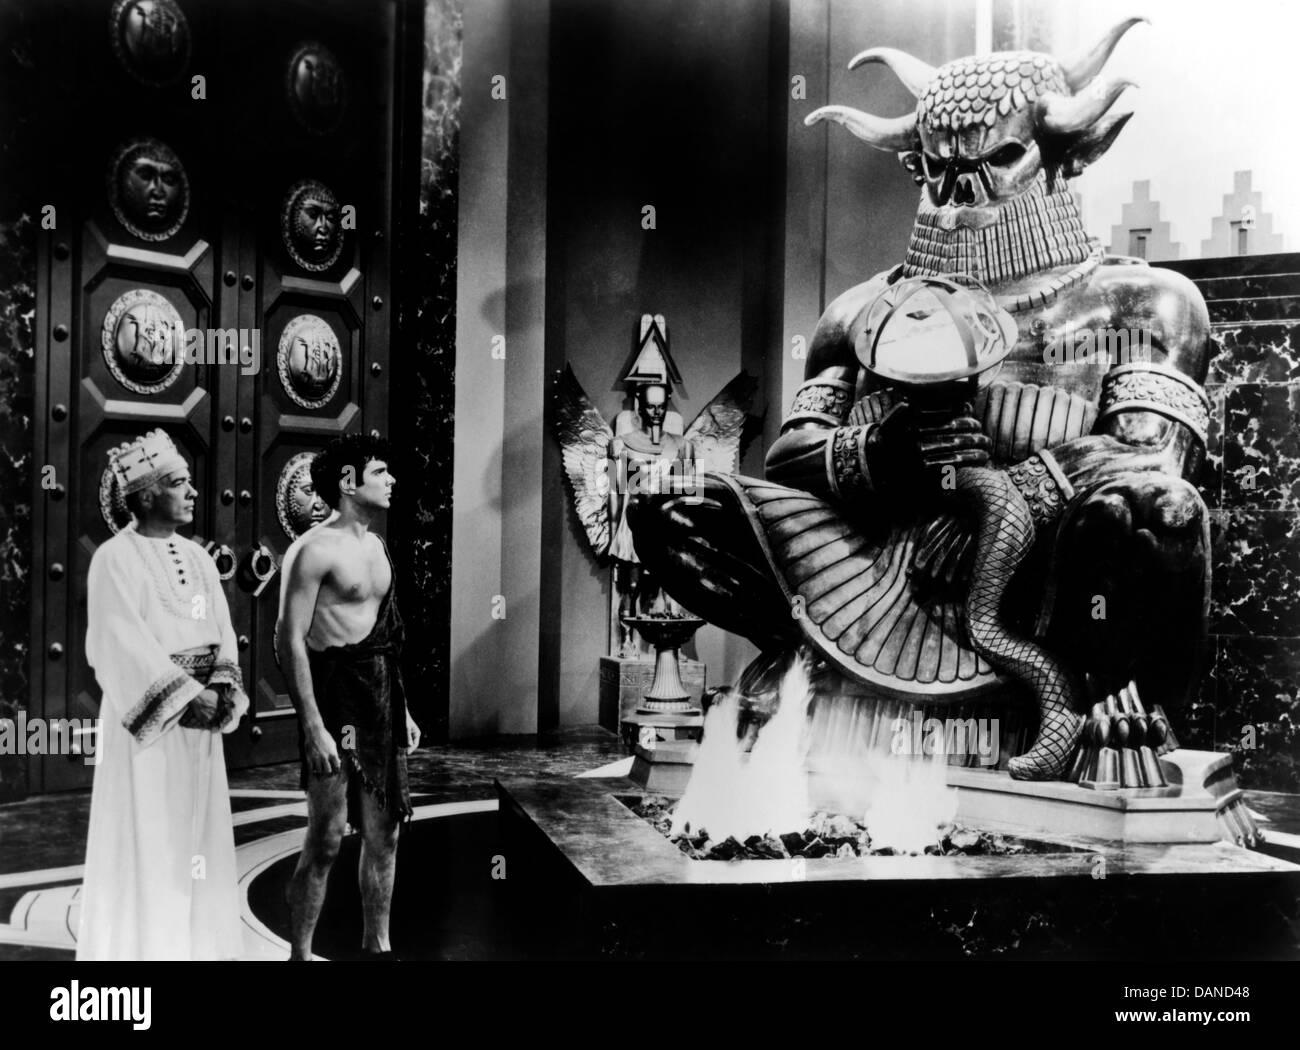 ATLANTIS, DER VERLORENE KONTINENT (1961), EDGAR STEHLI, ANTHONY HALL, GEORGE PAL (DIR) ALCO 002 MOVIESTORE SAMMLUNG Stockbild